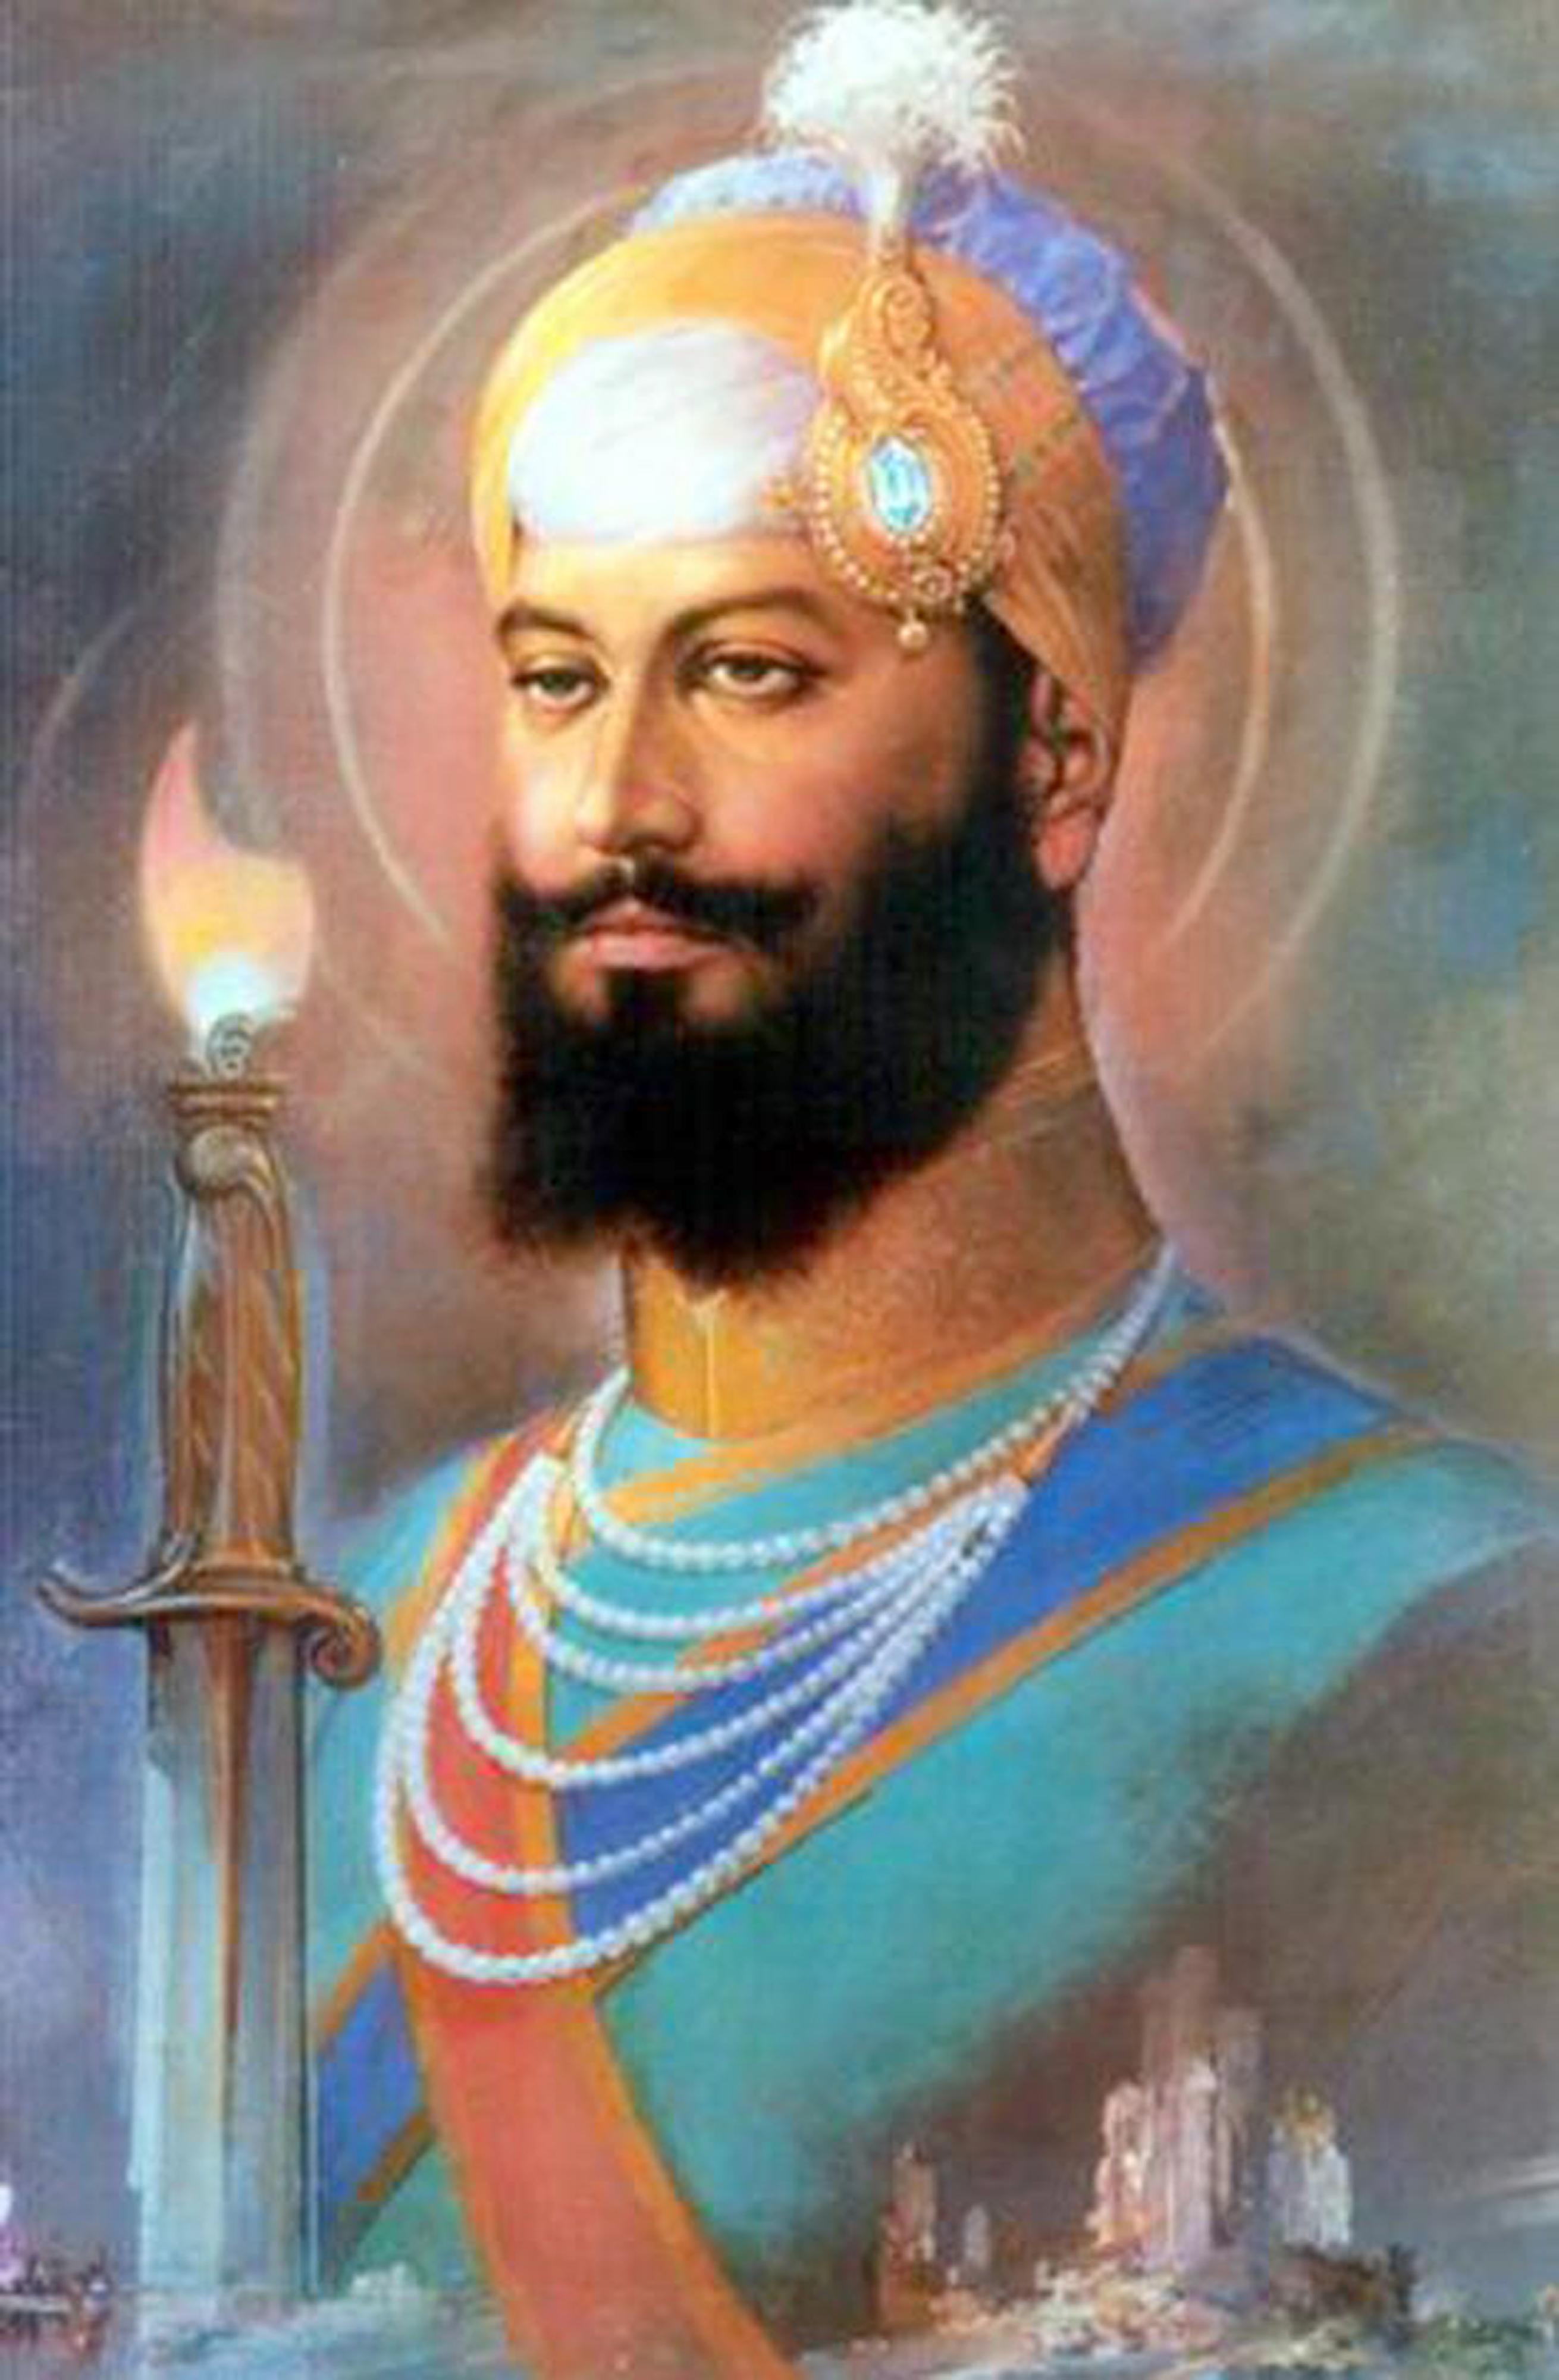 Sri Guru Hargobind Sahib Sen. Sec School (wattu bhatti) Makhu